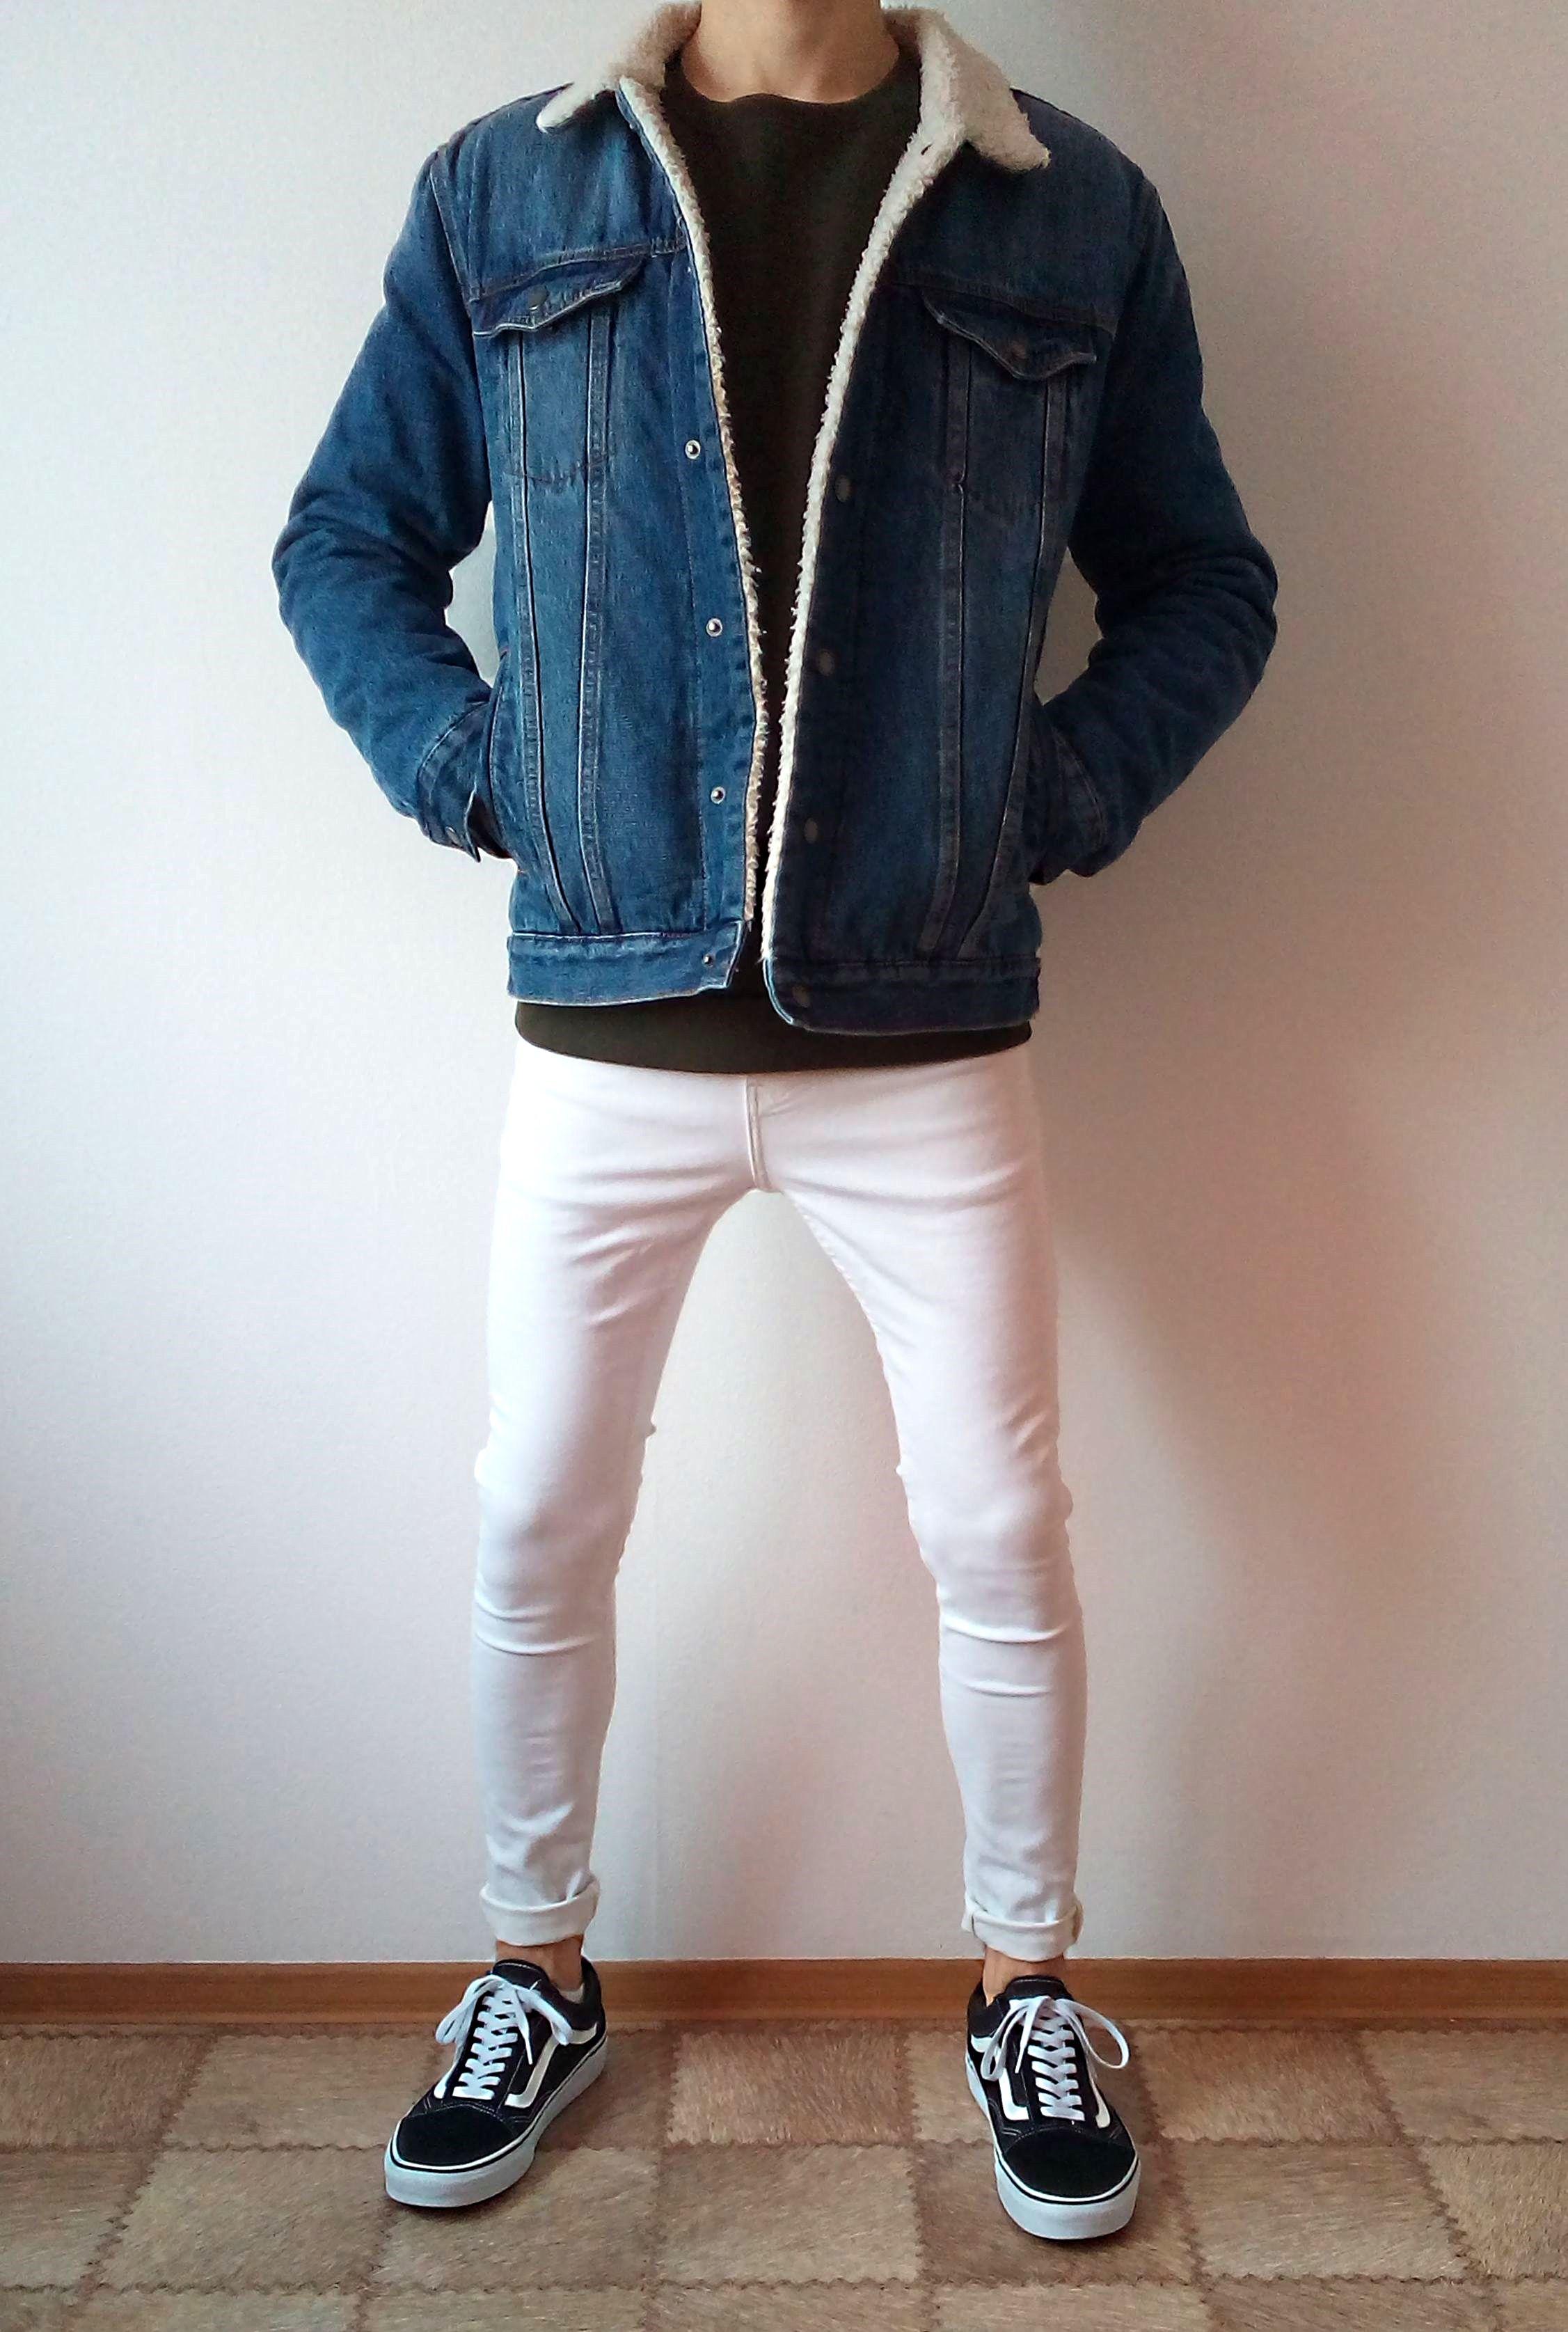 vans old skool white skinny jeans boys guys outfit